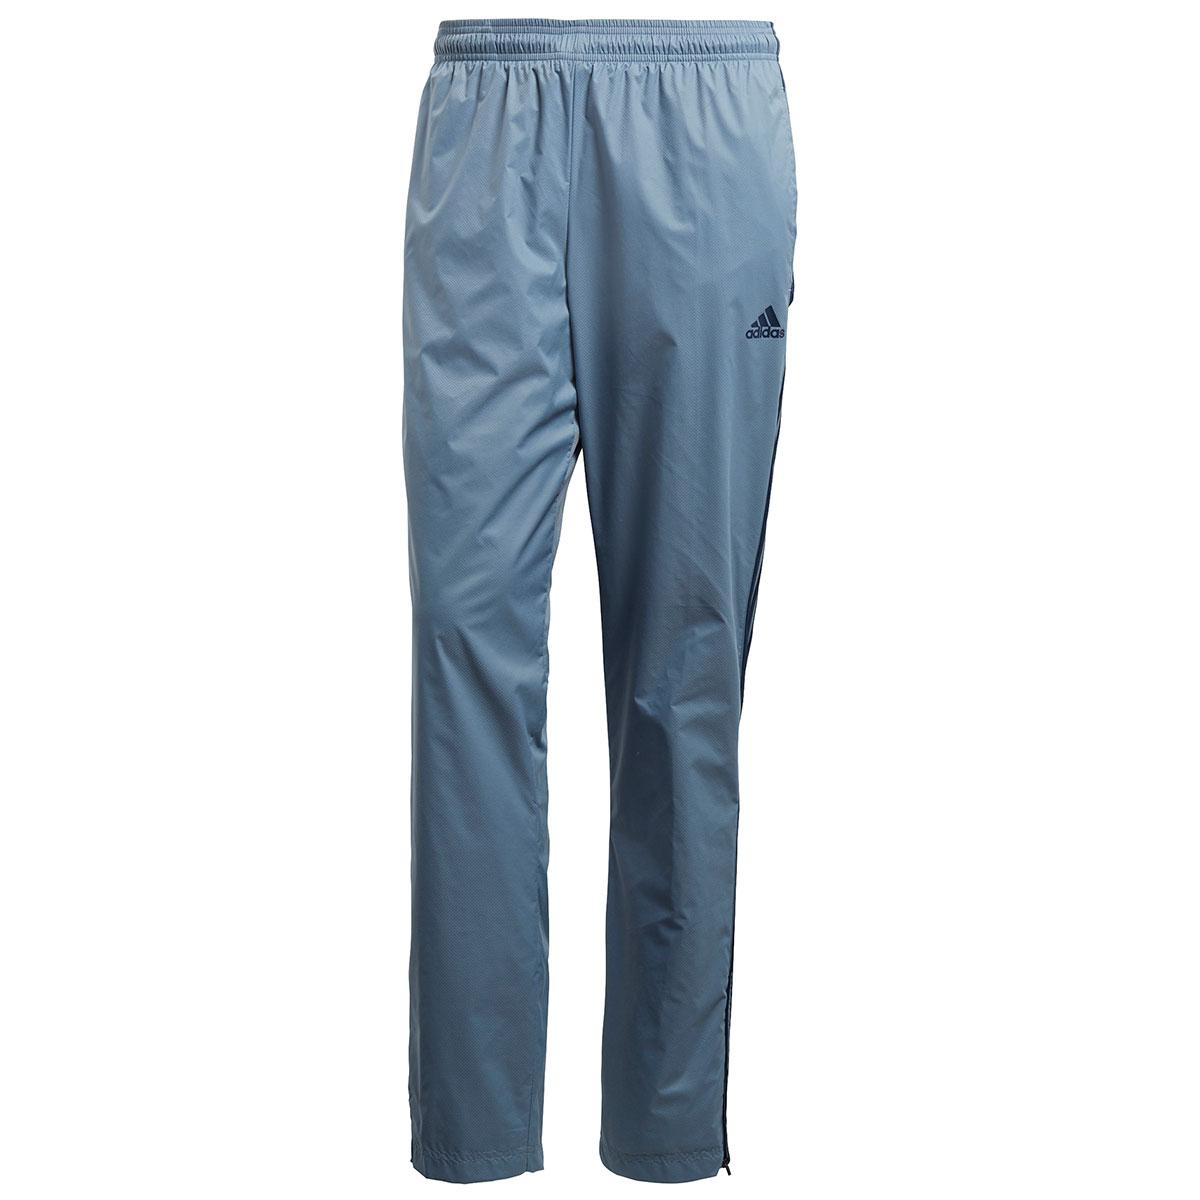 Adidas Men's Essentials 3-Stripe Pants - Black, XXL